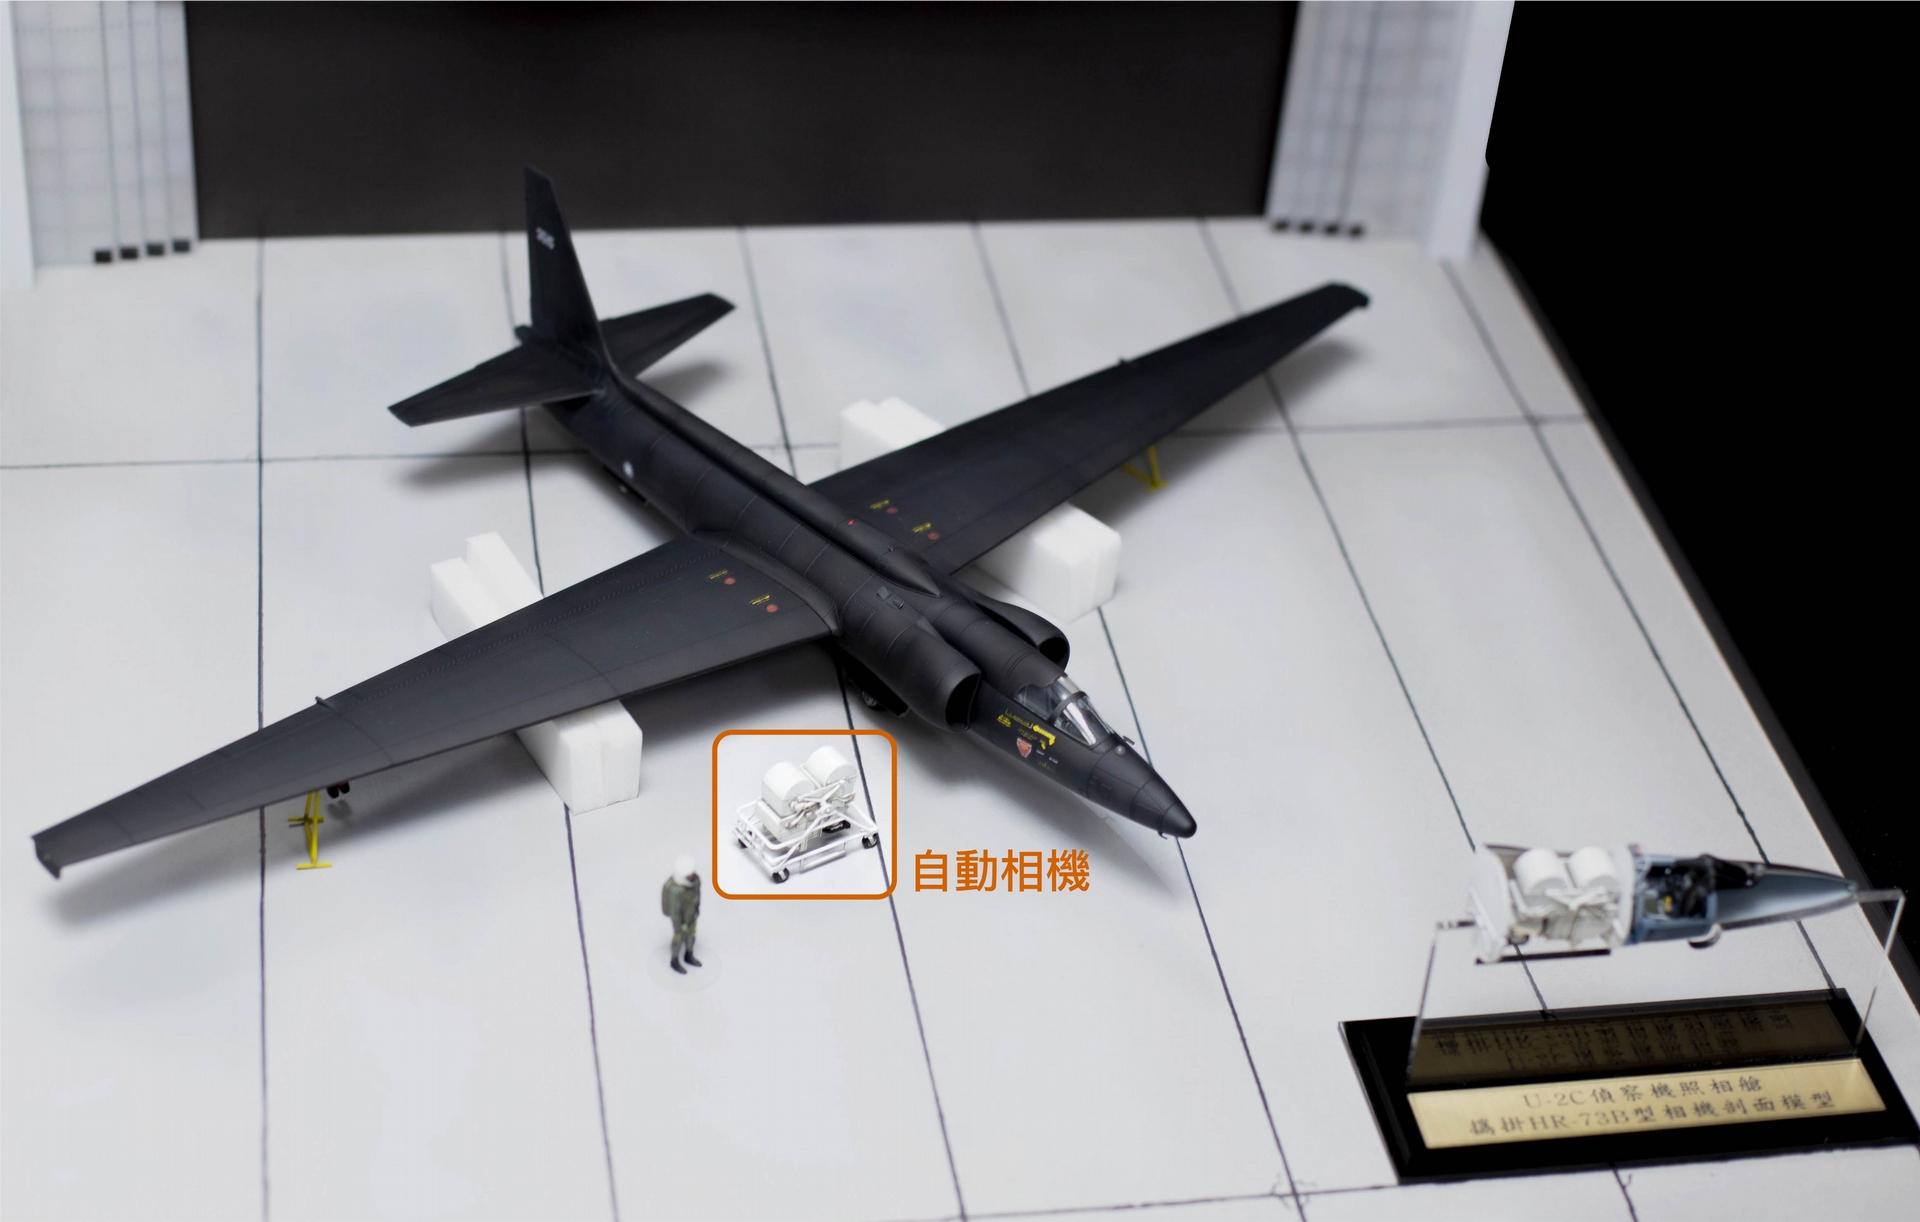 U-2 偵察機縮小模型,圖中飛行員旁的白色裝置,即是安裝在機腹下方的自動相機。 圖│研之有物